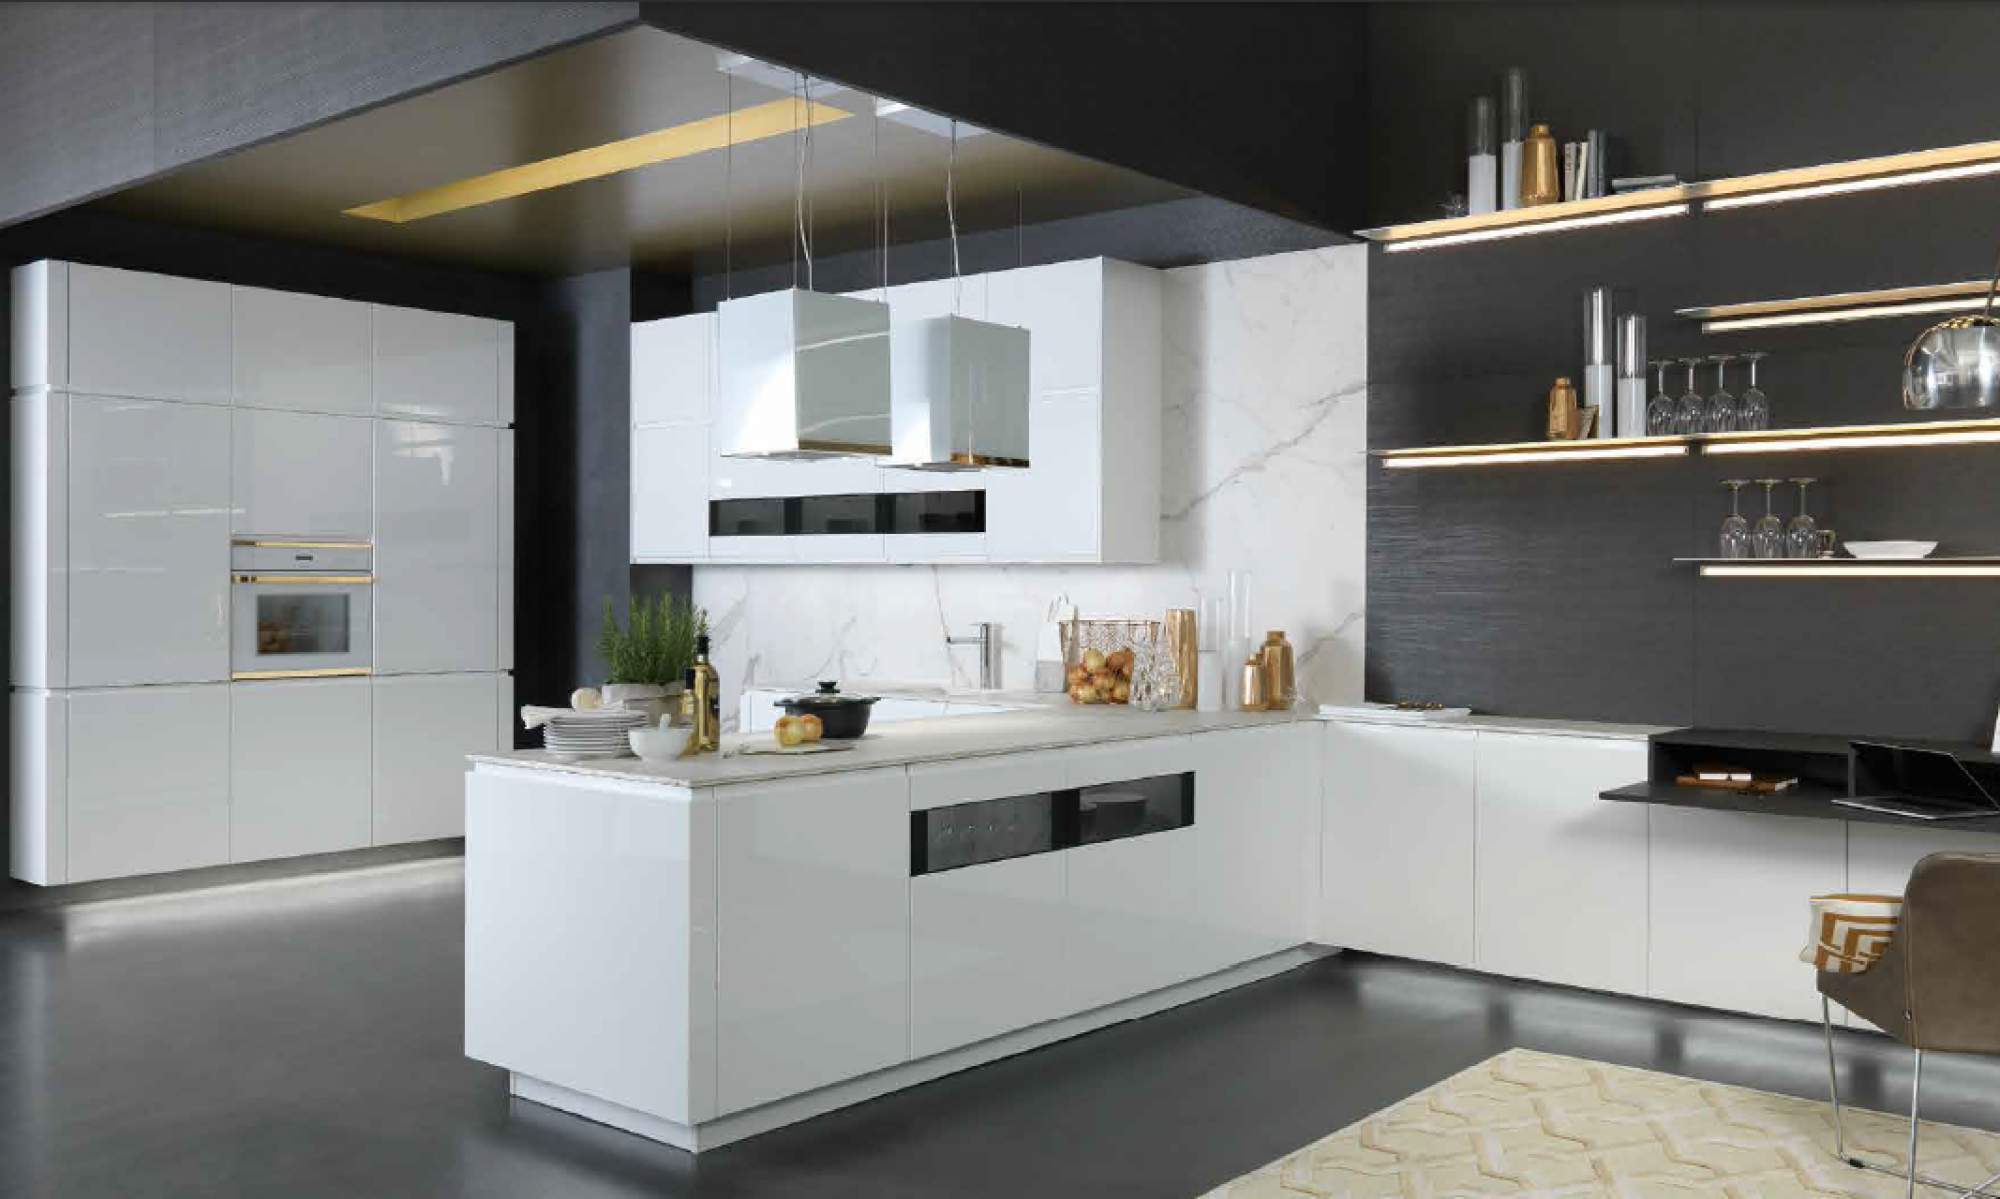 Arga Keukens & Montage